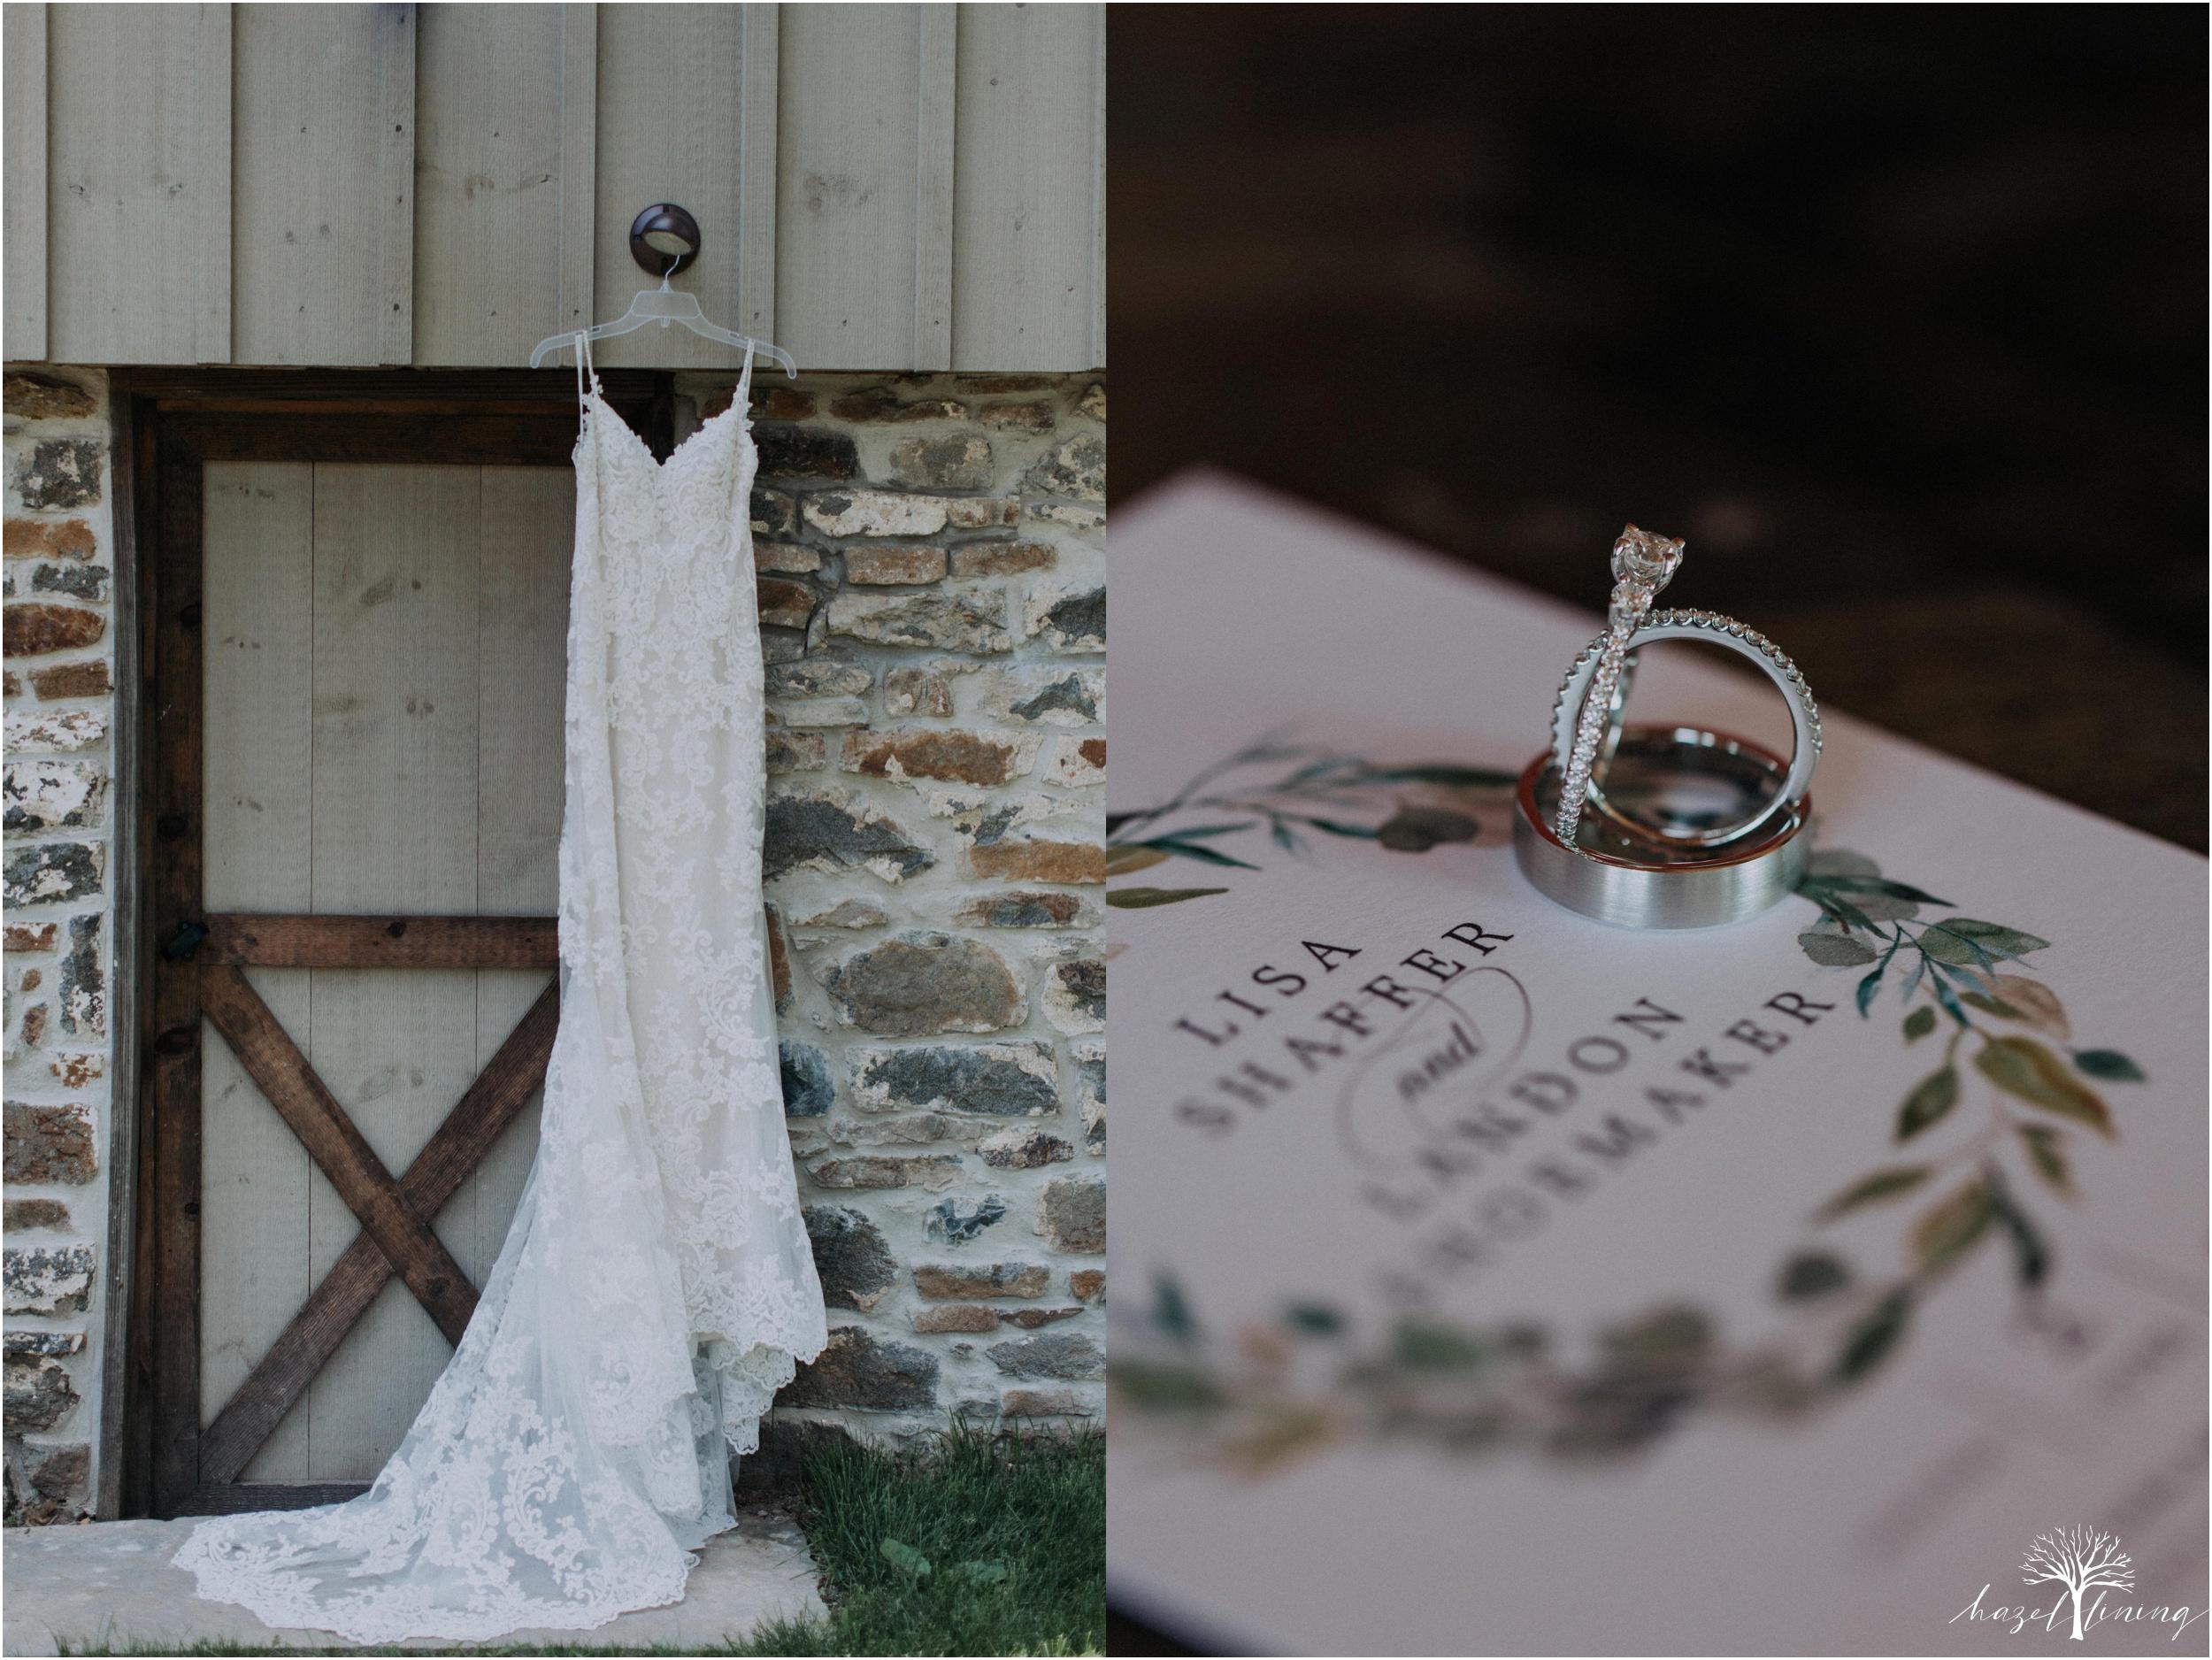 hazel-lining-travel-wedding-elopement-photography-lisa-landon-shoemaker-the-farm-bakery-and-events-bucks-county-quakertown-pennsylvania-summer-country-outdoor-farm-wedding_0002.jpg